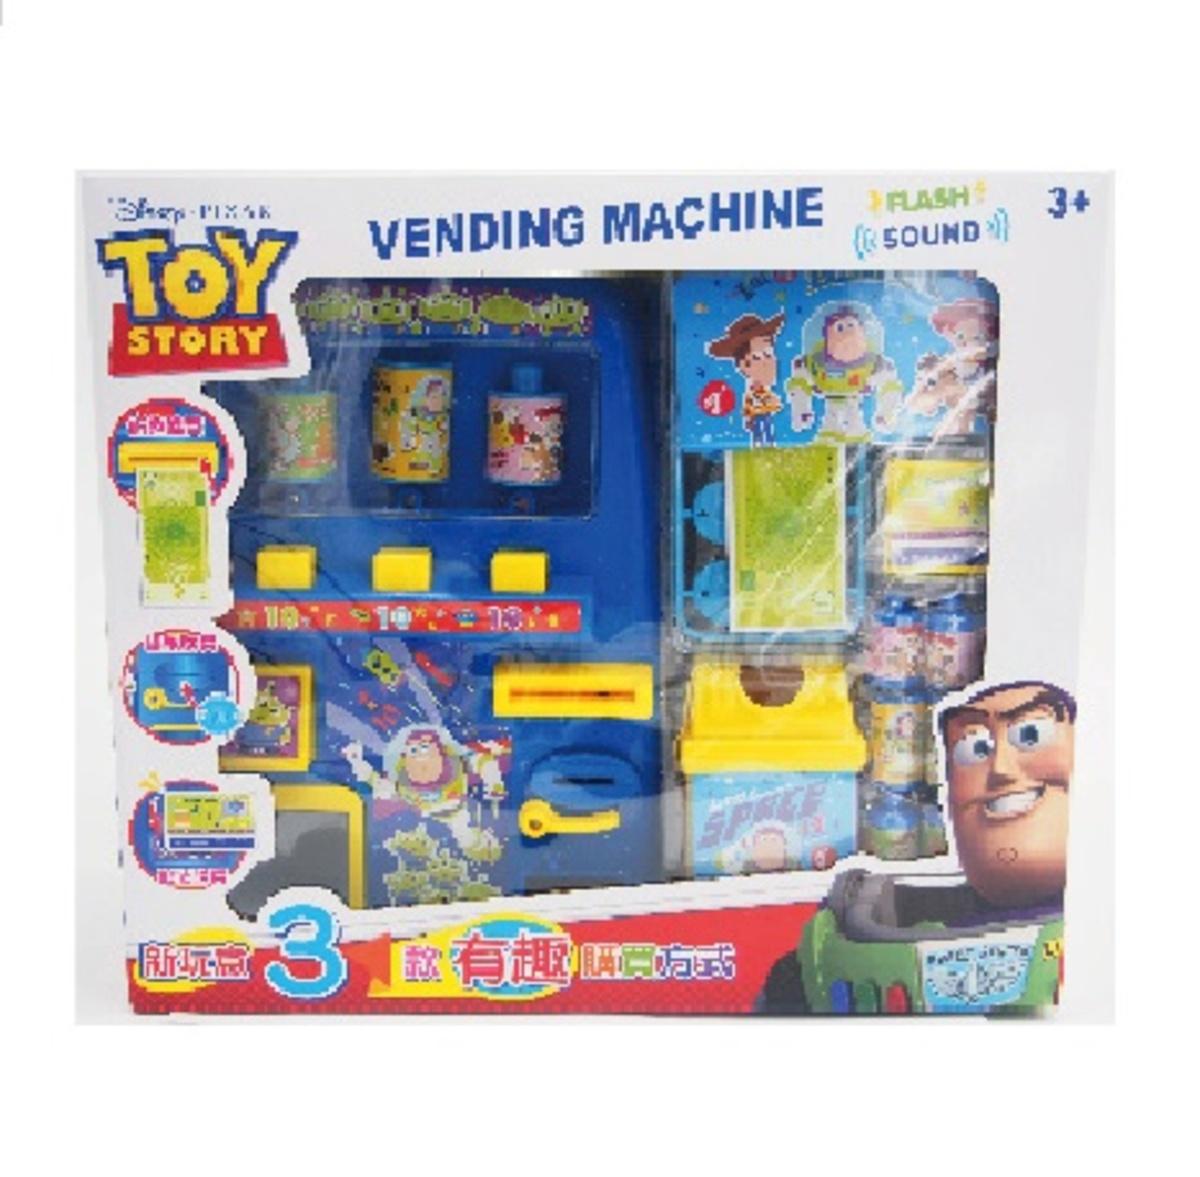 Toy Story Vending Machine